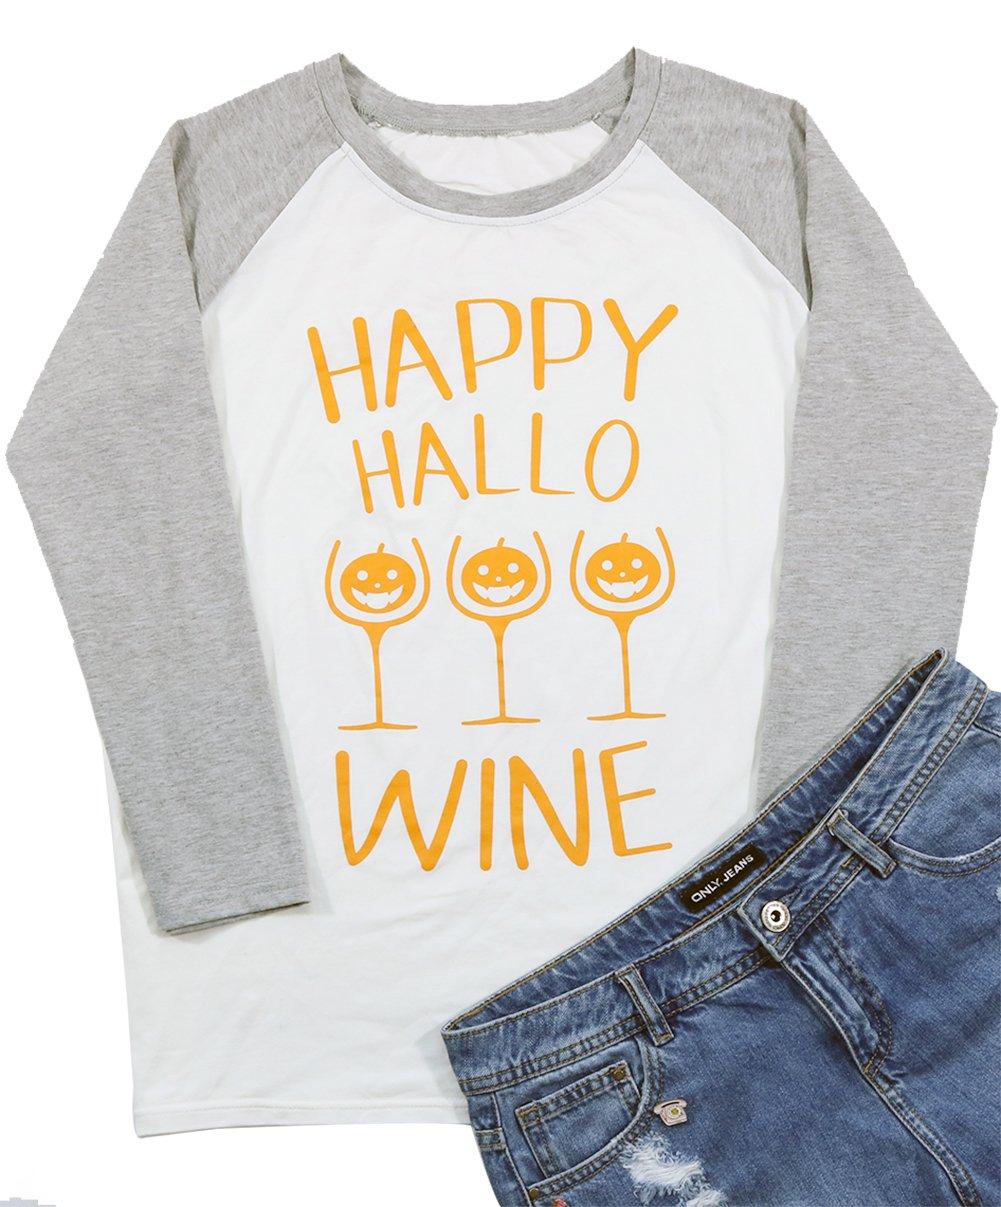 Happy Hallo Wine Wineglass Pumpkin Graphic Women's Shirt Splicing Sleeve Raglan Baseball Top Blouse Size Large (Gray)